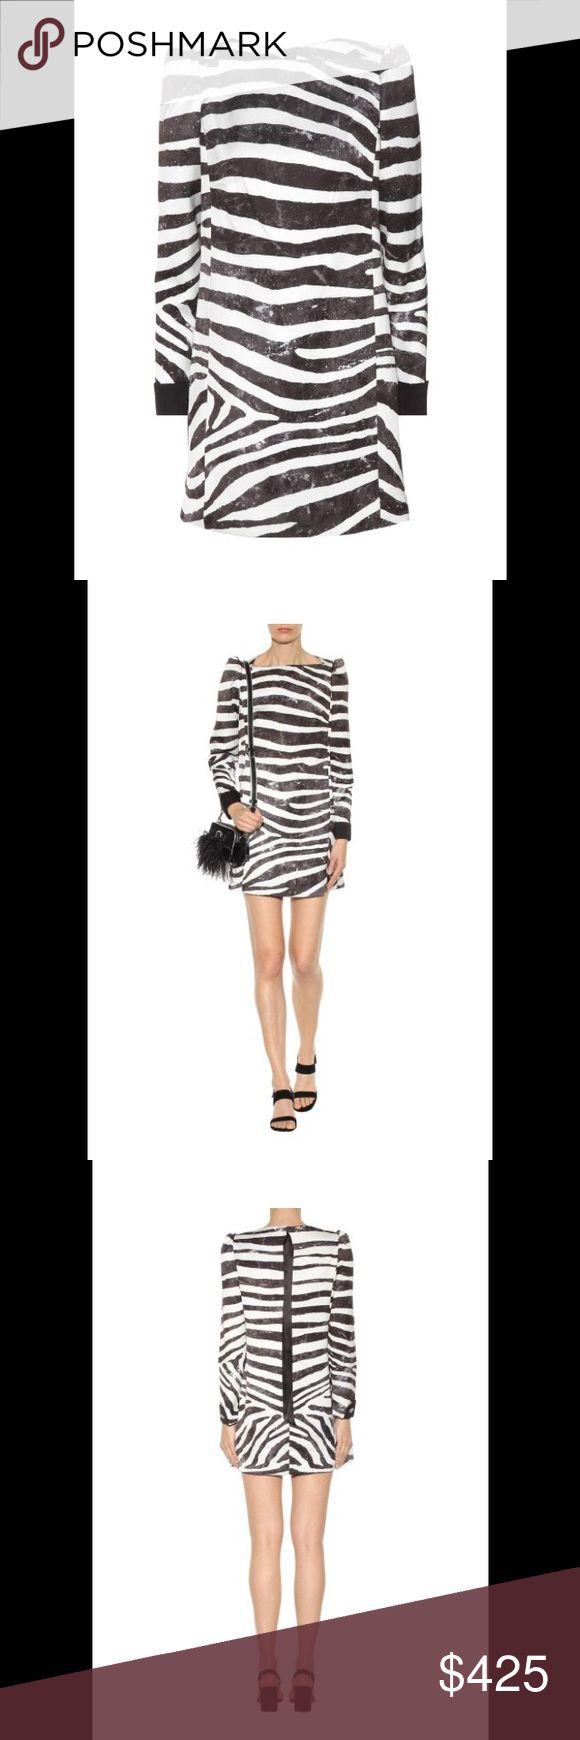 Marc Jacobs Zebra Print Dress  ❗️NTW❗️ Zebra printed mini dress. Marc Jacobs ❗️New with Tags❗️*fit is closer to Juniors size 11/12* offers welcome Marc Jacobs Dresses Mini